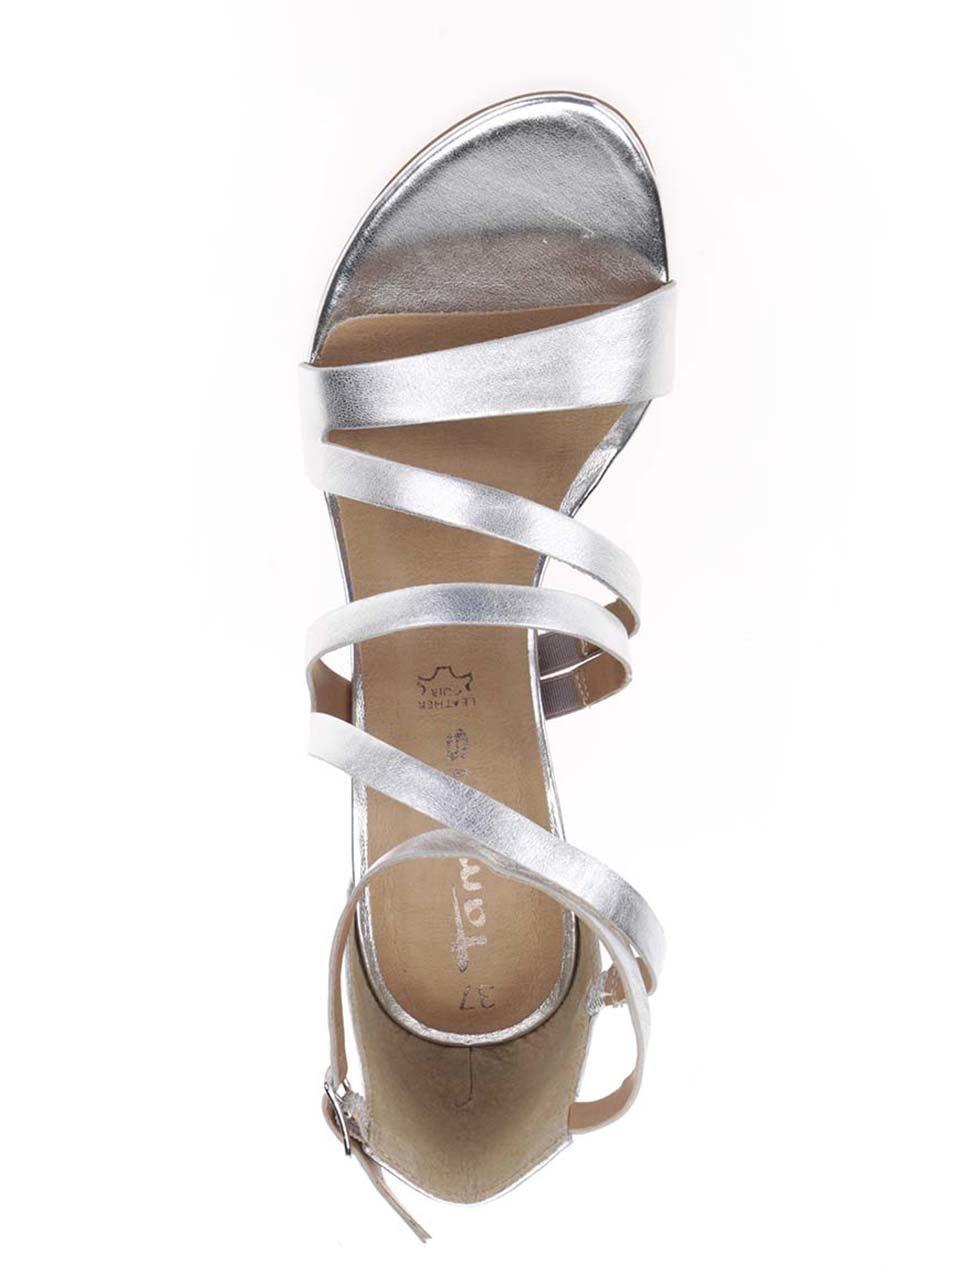 ca2ca92741b Kožené páskové sandálky ve stříbrné barvě na podpatku Tamaris ...